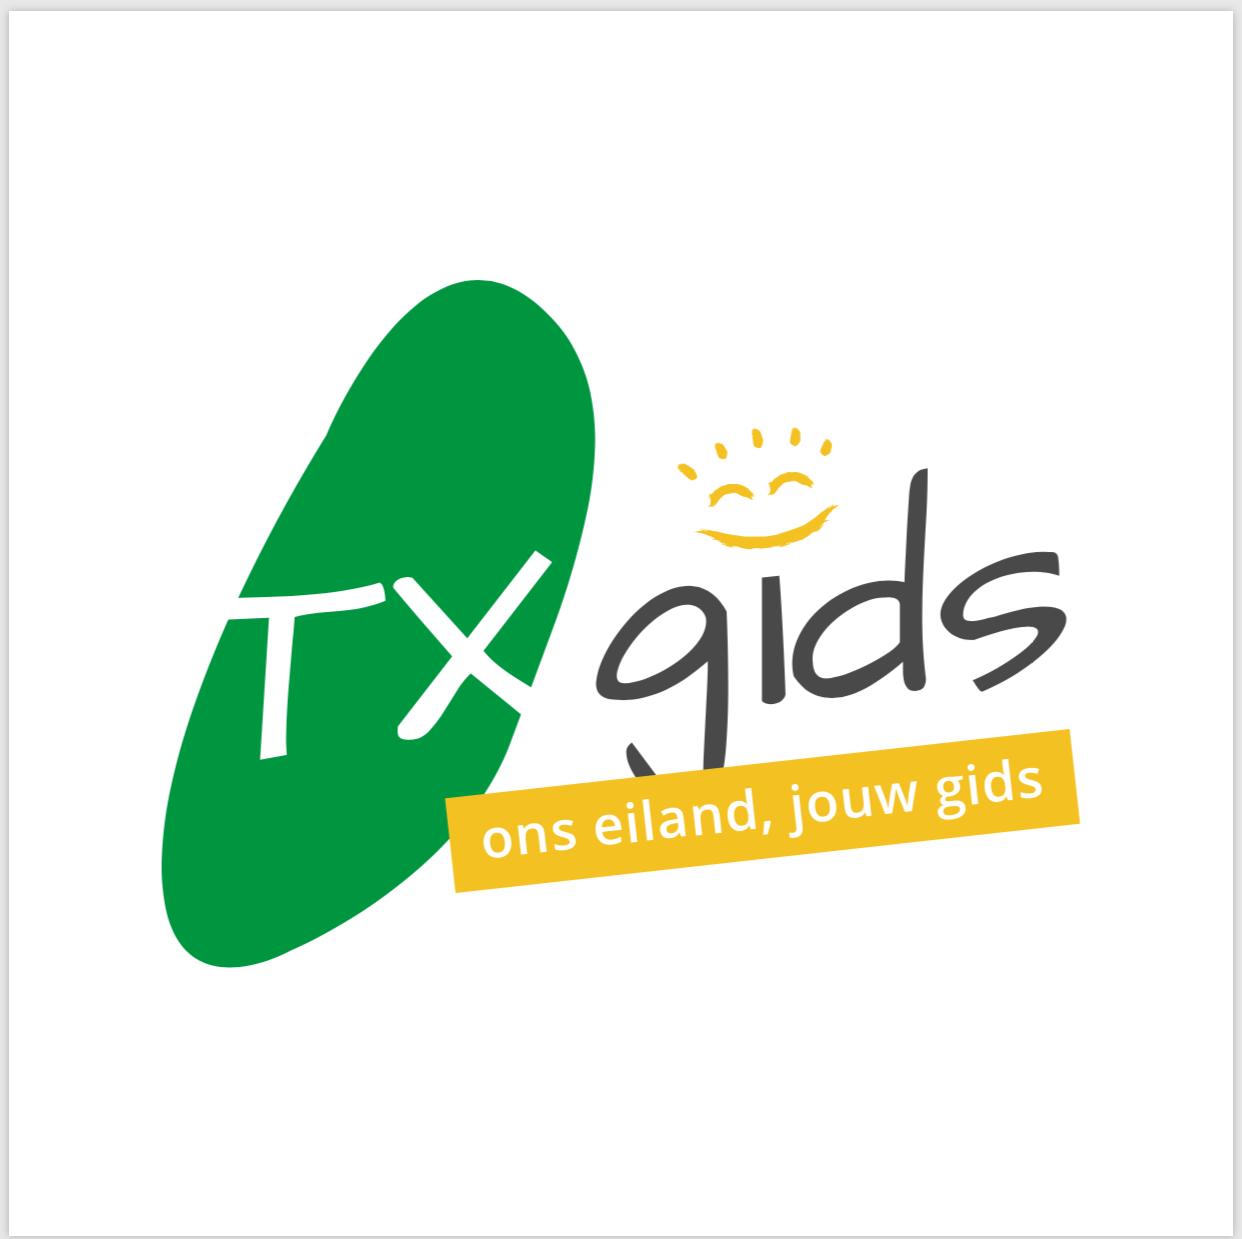 logo txgids